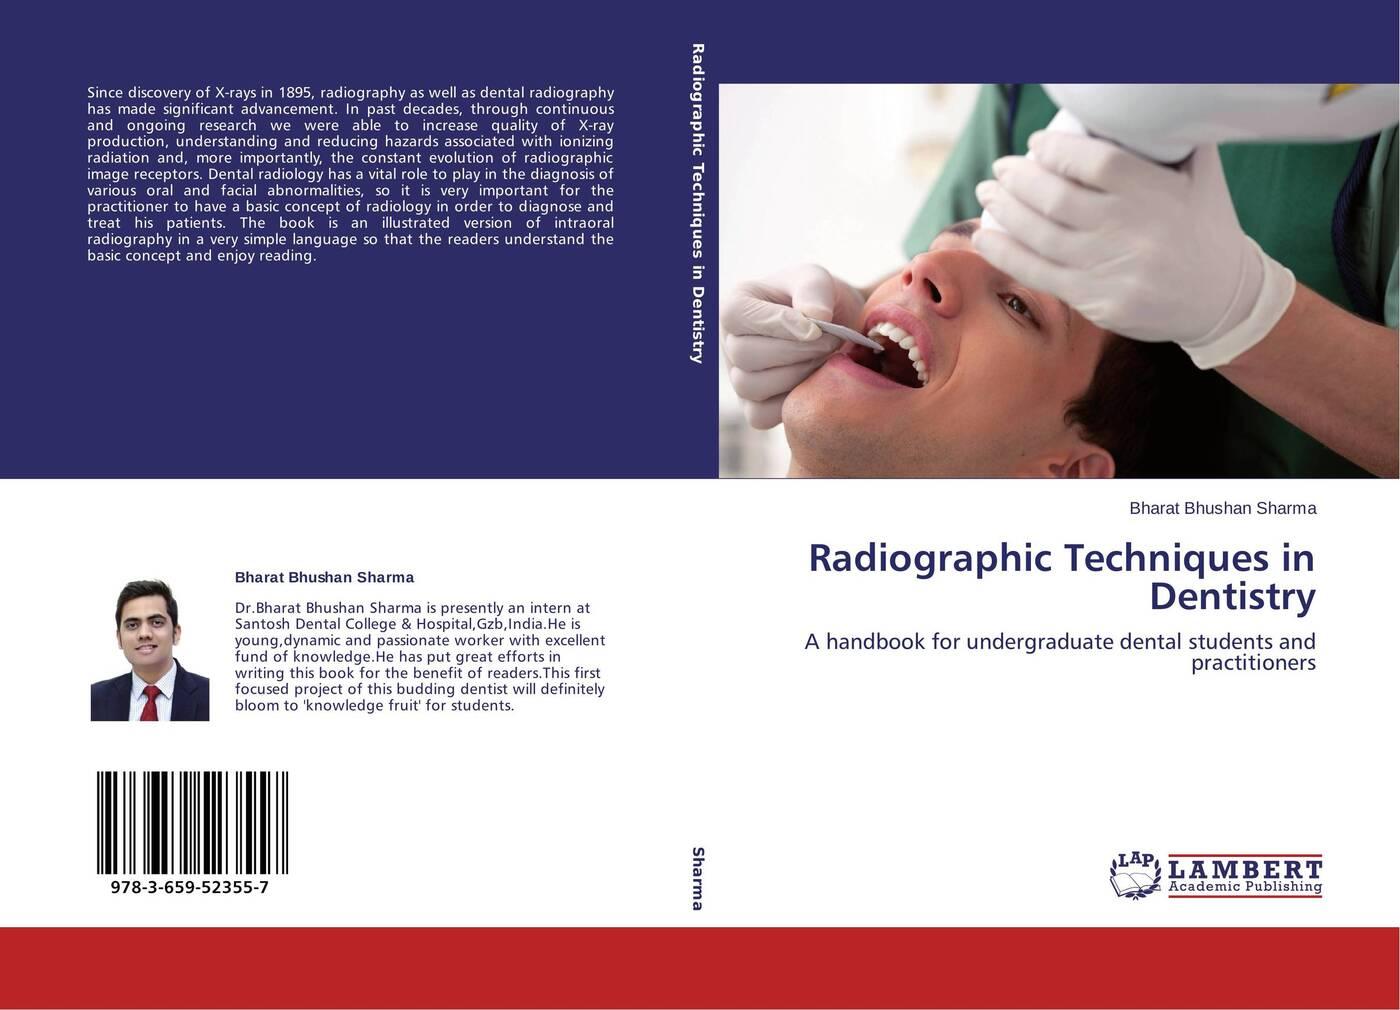 купить Bharat Bhushan Sharma Radiographic Techniques in Dentistry по цене 3564 рублей